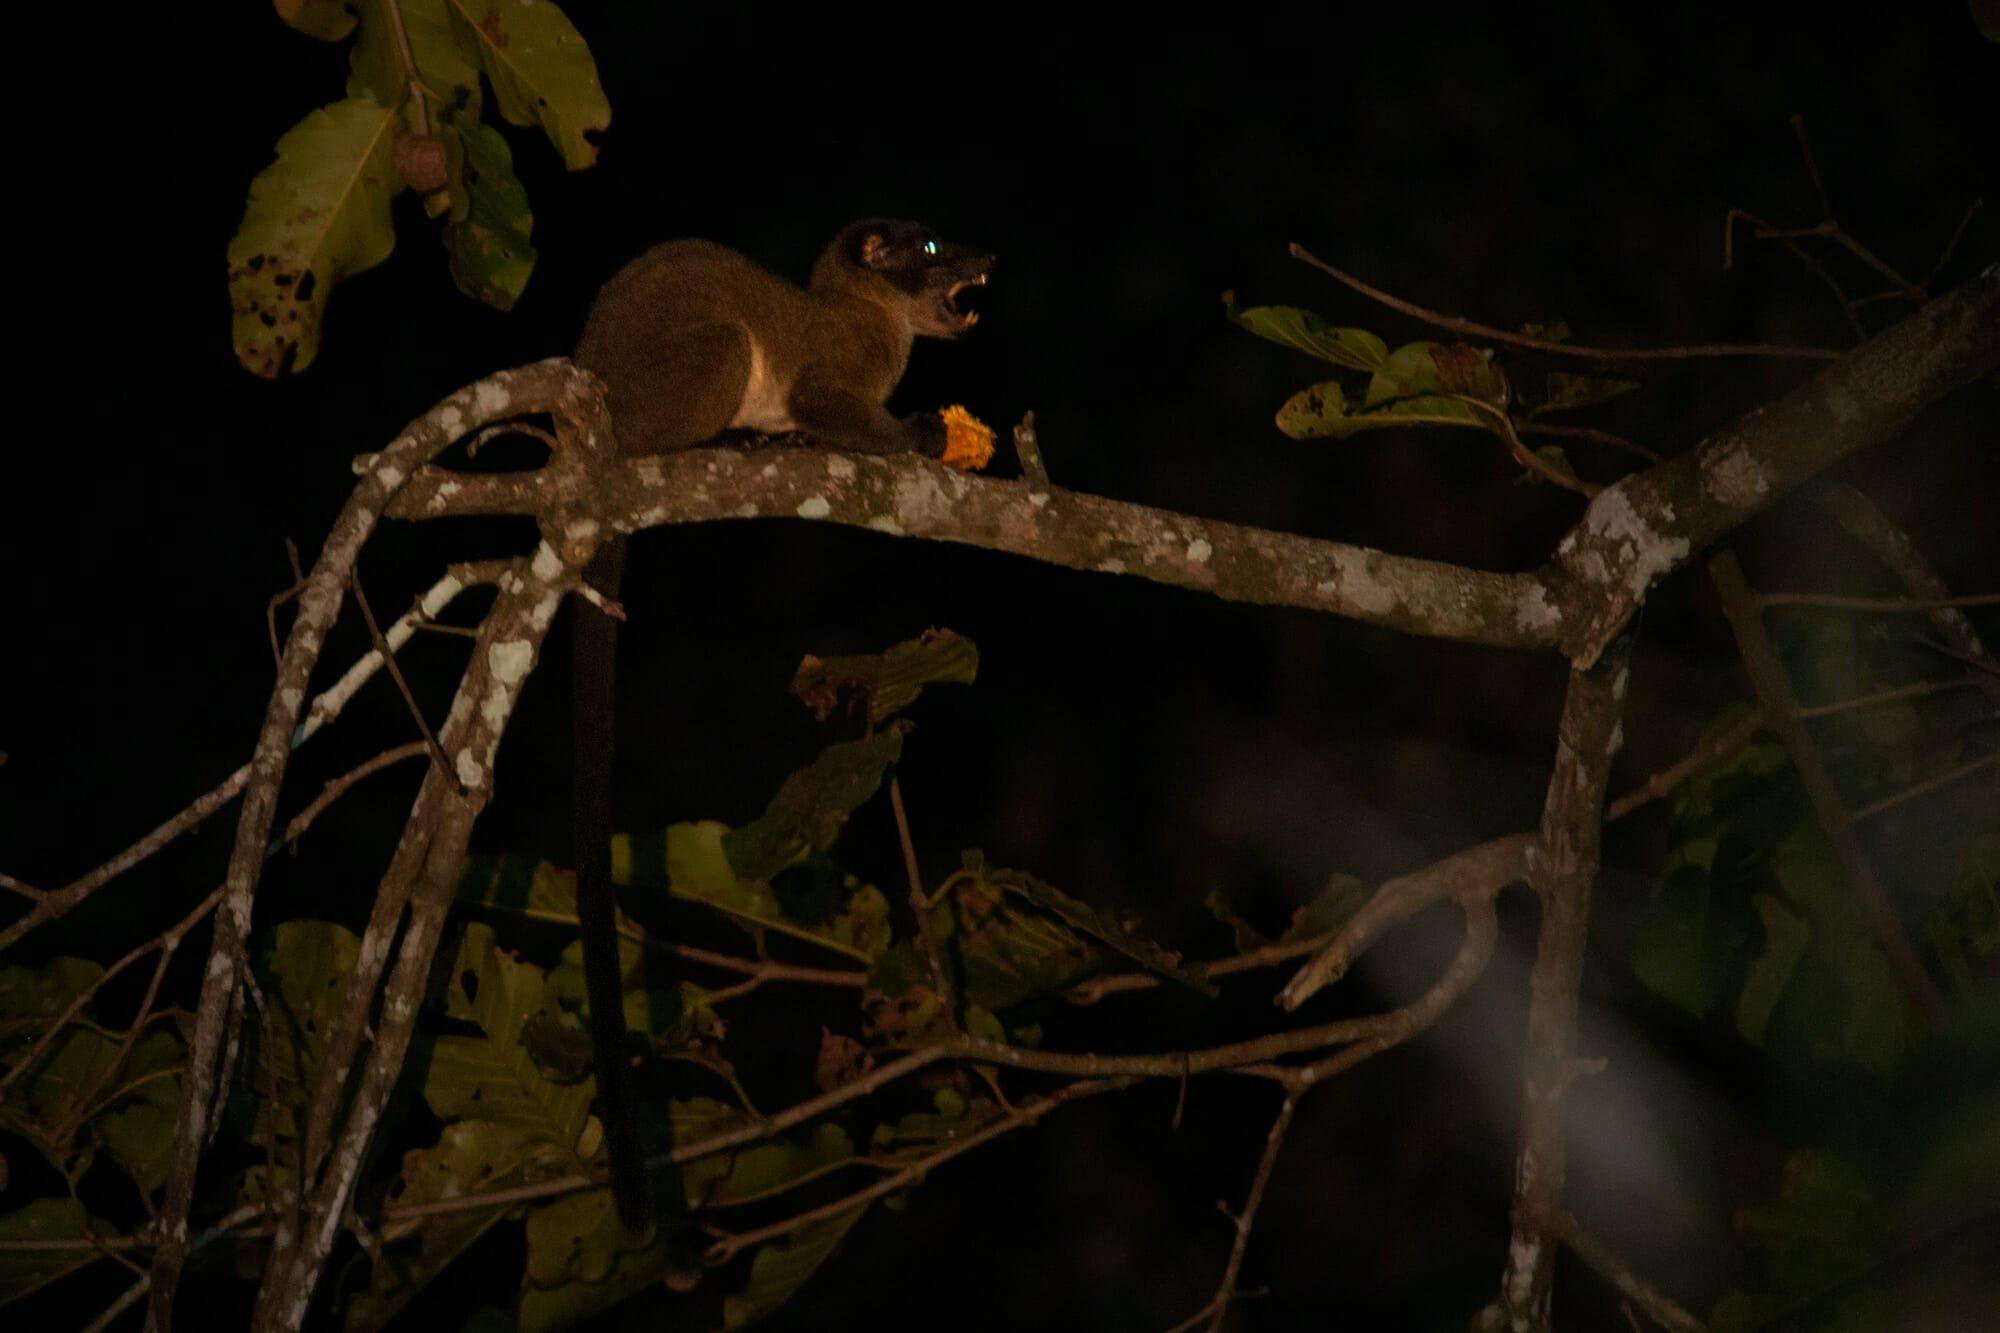 Wildlife of Kinabatangan river - Three-striped palm civet